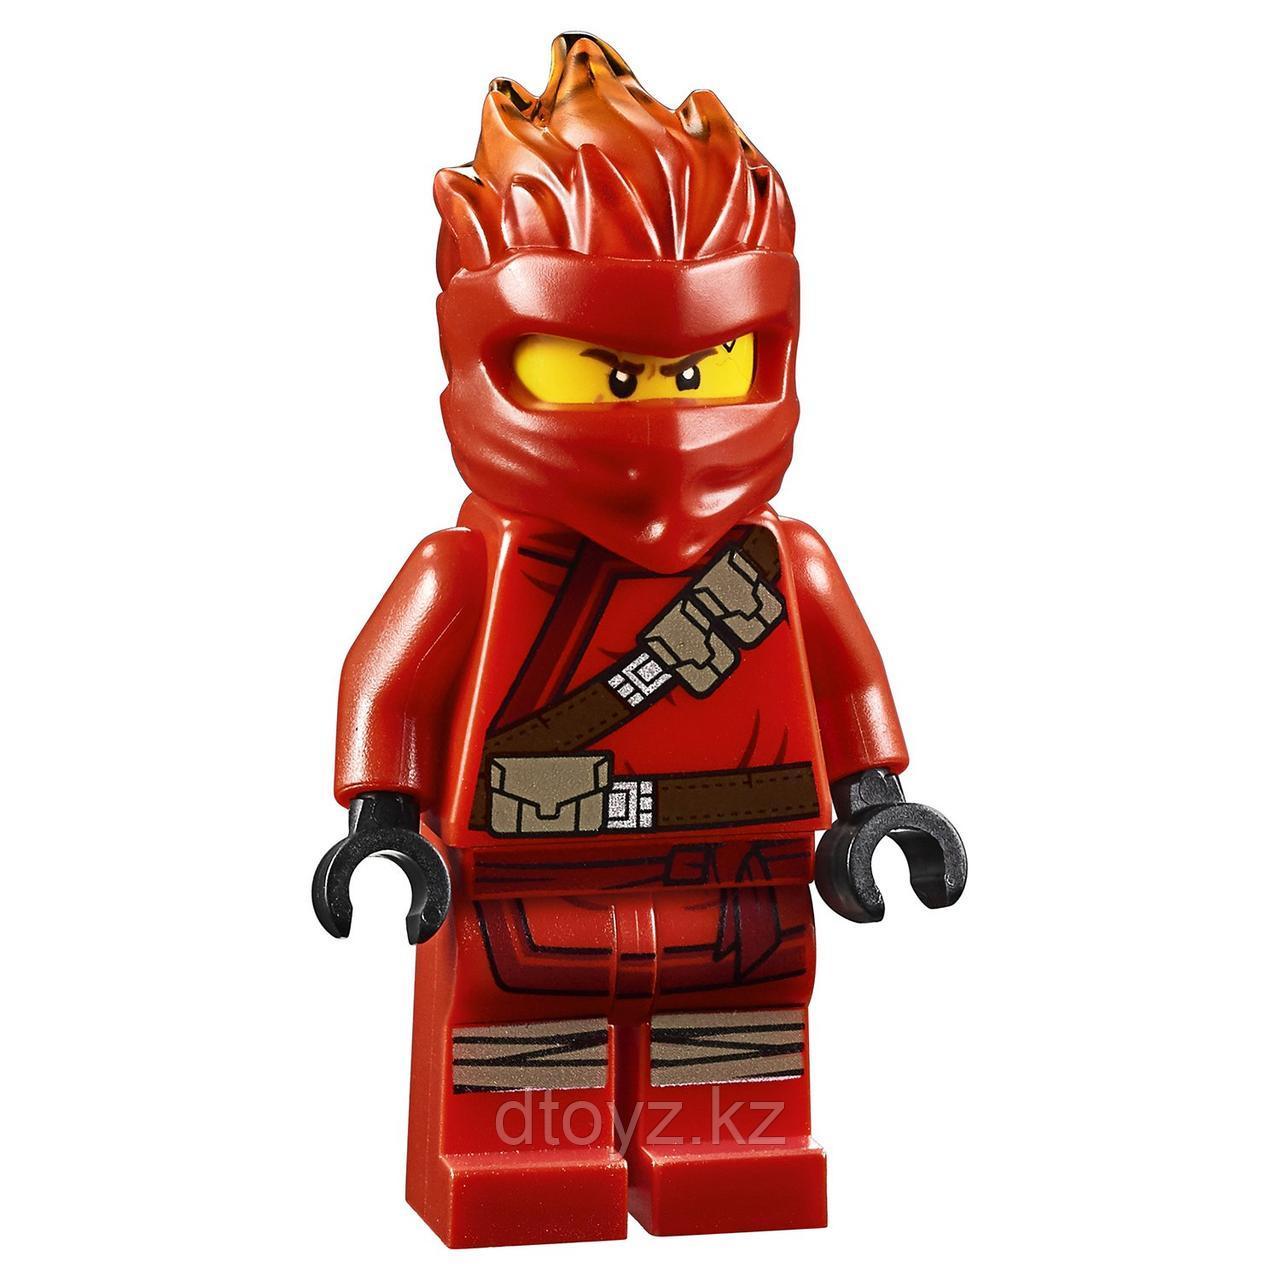 Lego Ninjago 70674 Огненный кинжал, Лего Ниндзяго - фото 4